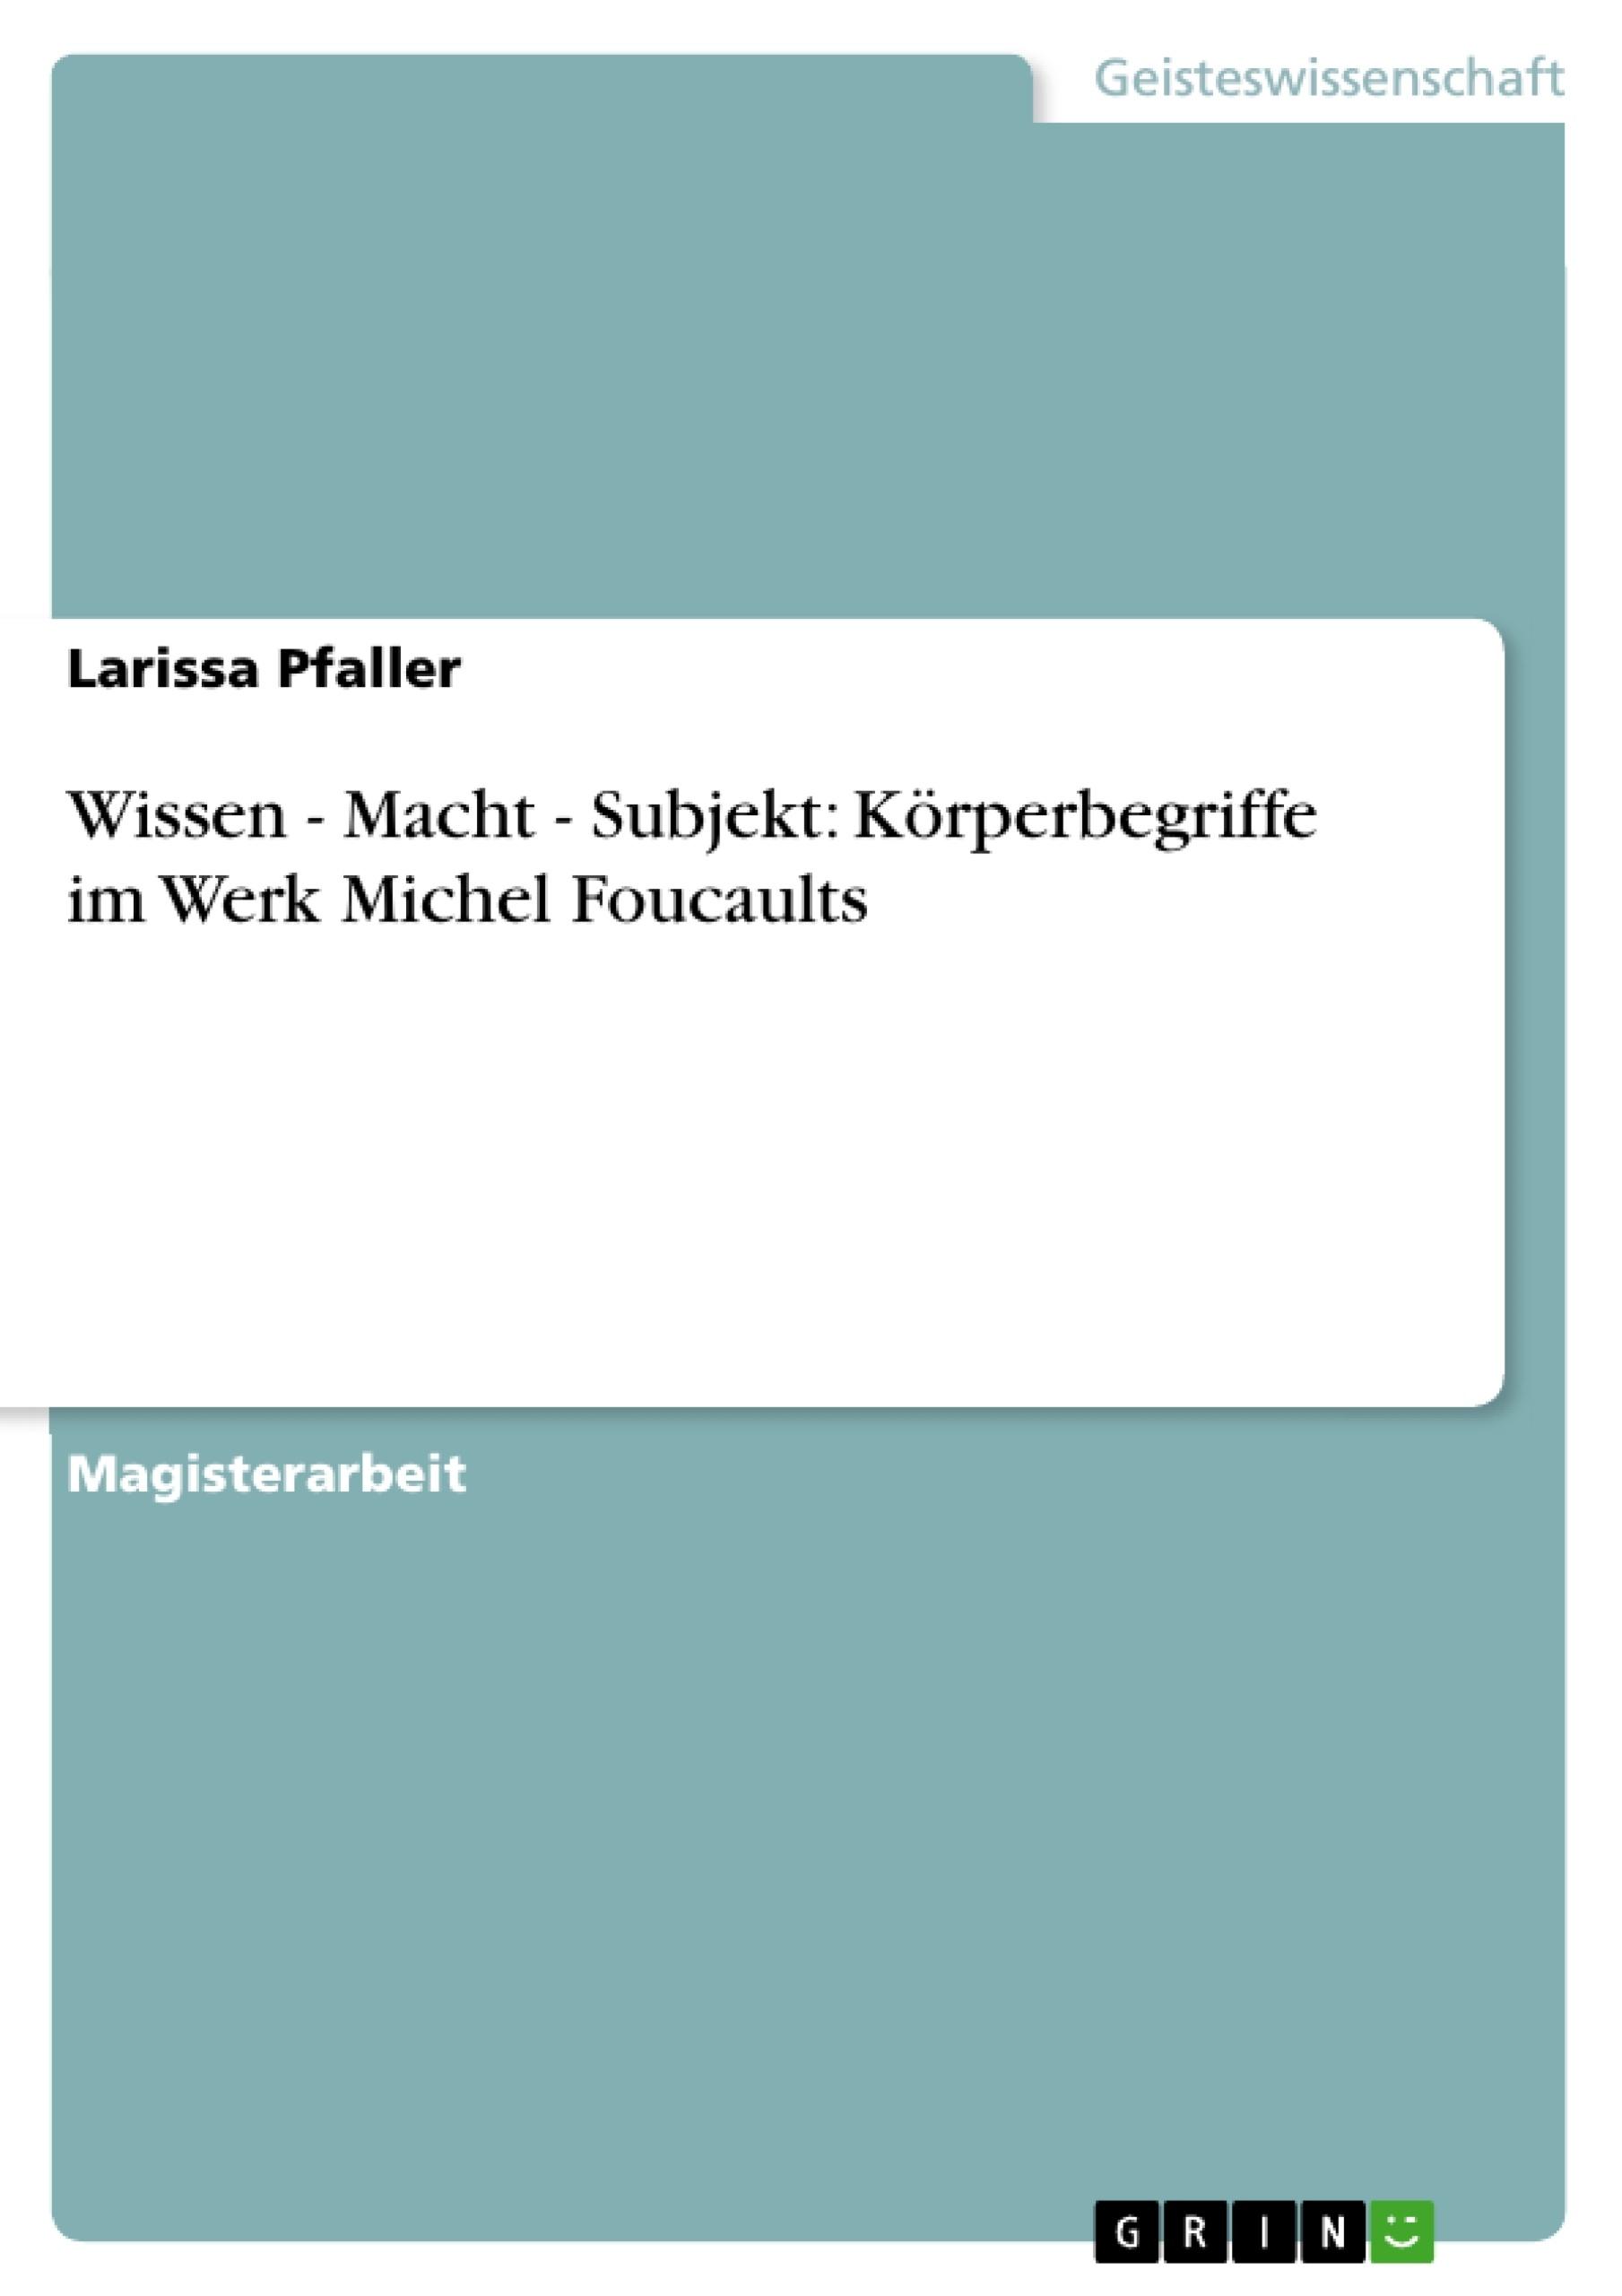 Charmant Charles Gesetz Arbeitsblatt Ideen - Super Lehrer ...